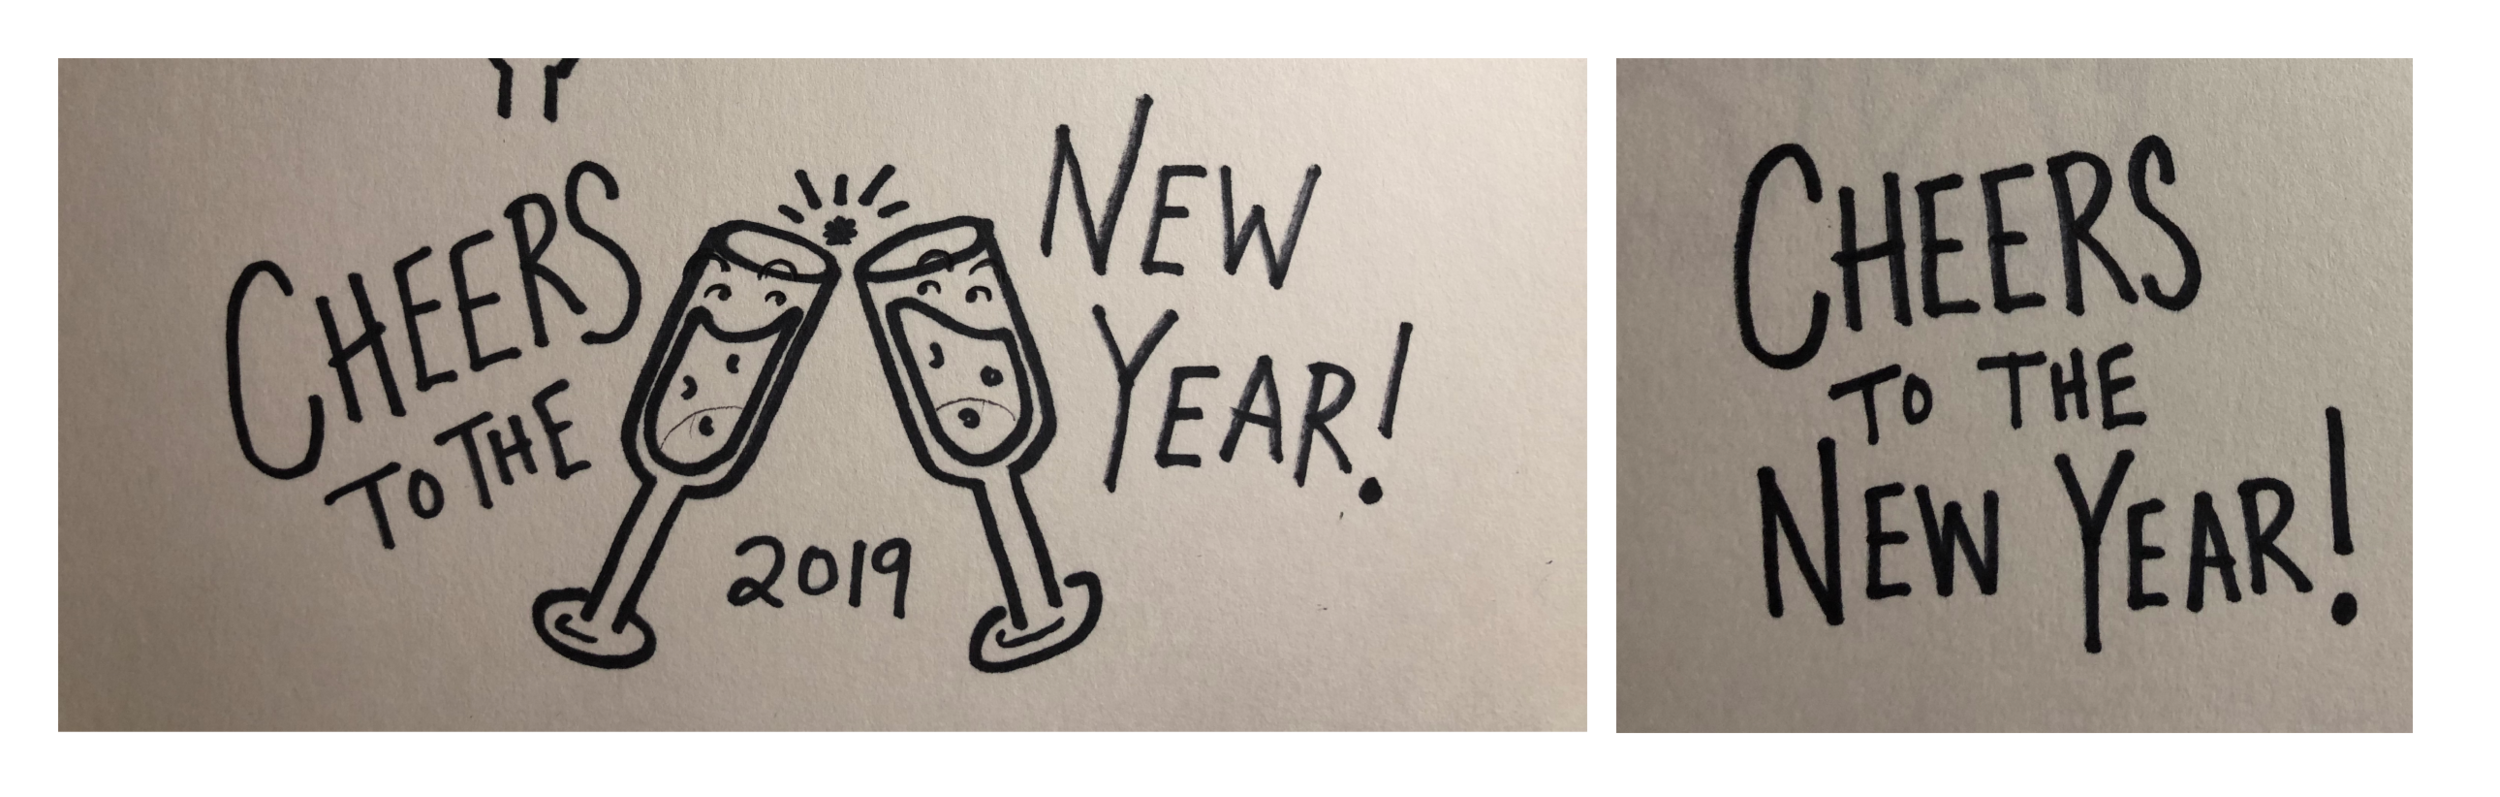 elizabeth_korb_sketches-new-years-card-2019.png